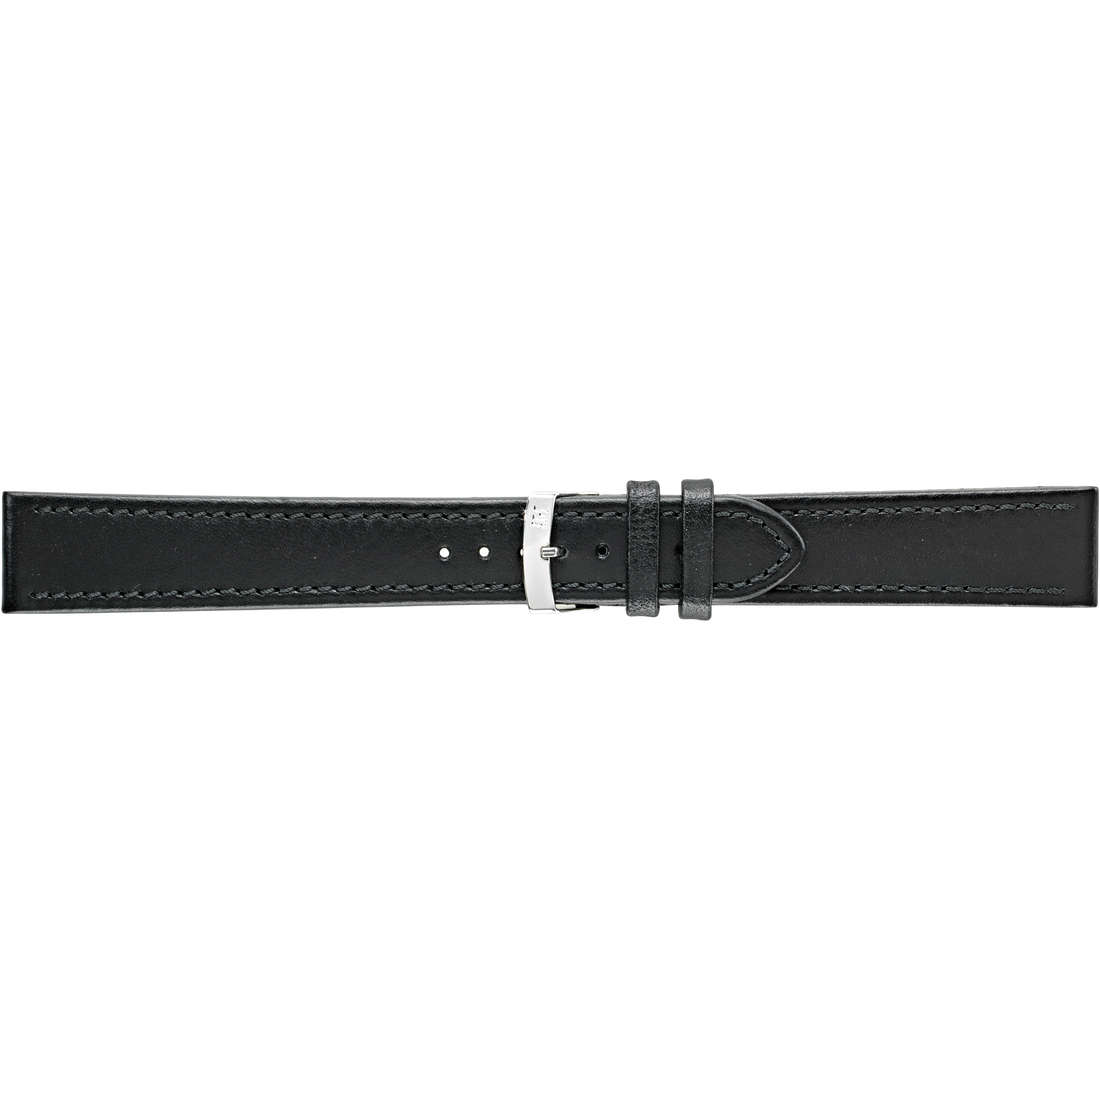 watch watch bands watch straps man Morellato I Lunghi A01K3151237019CR22